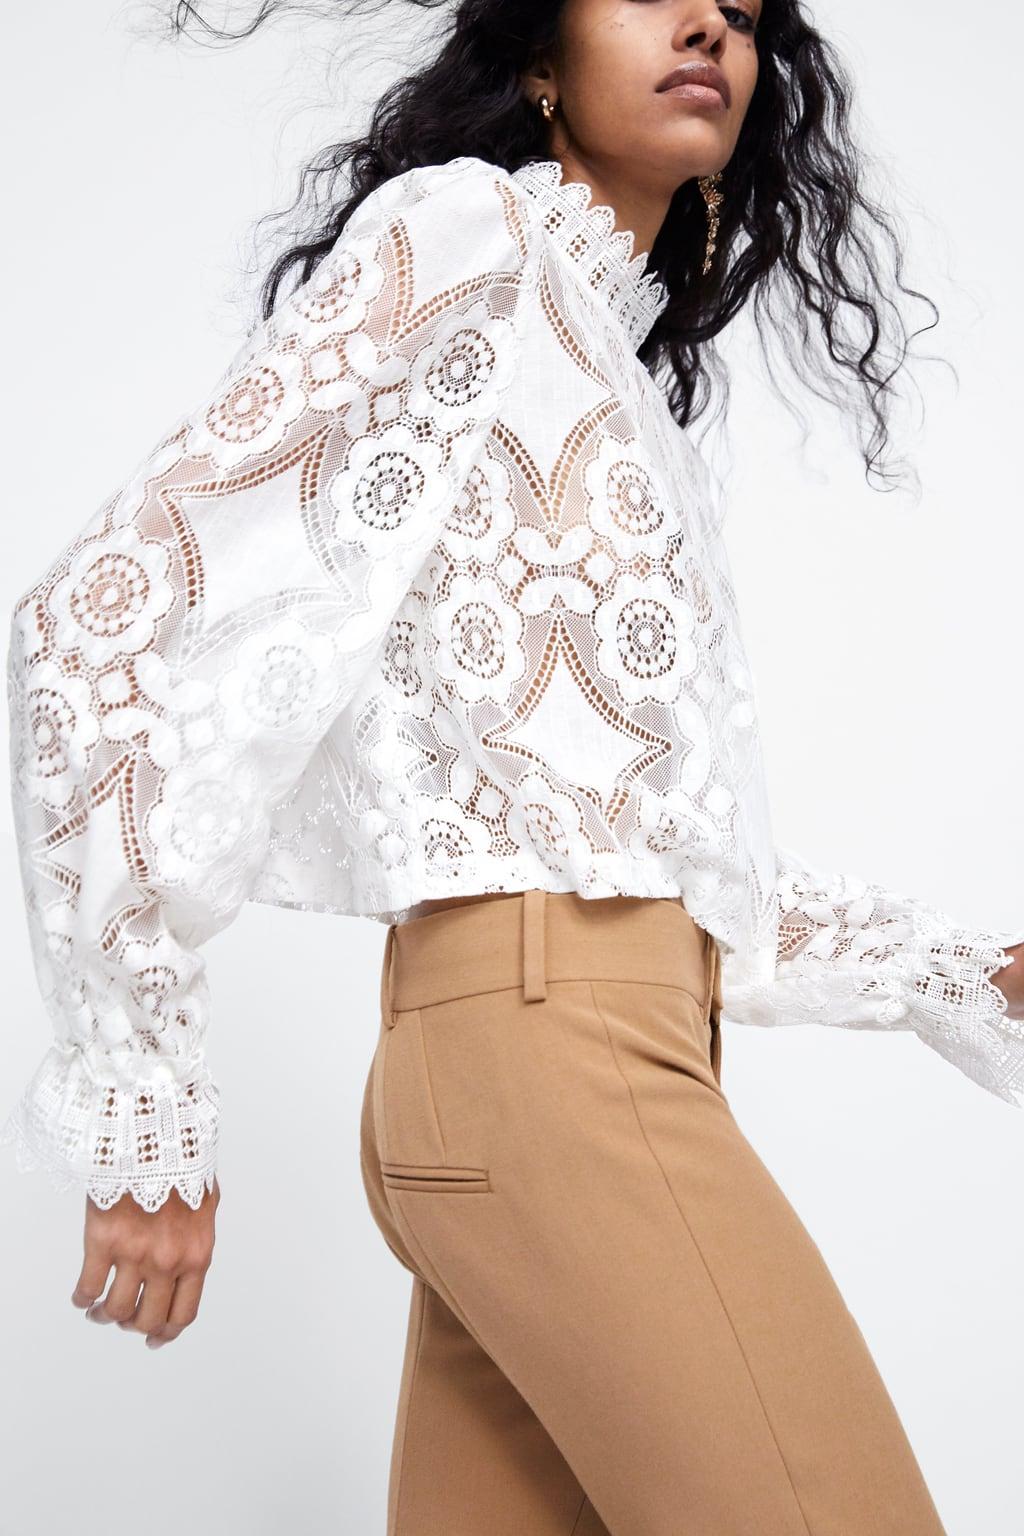 91472904e2 Ta koronkowa bluzka Zara jest już hitem na instagramie - Elle.pl - trendy  wiosna lato 2019  moda